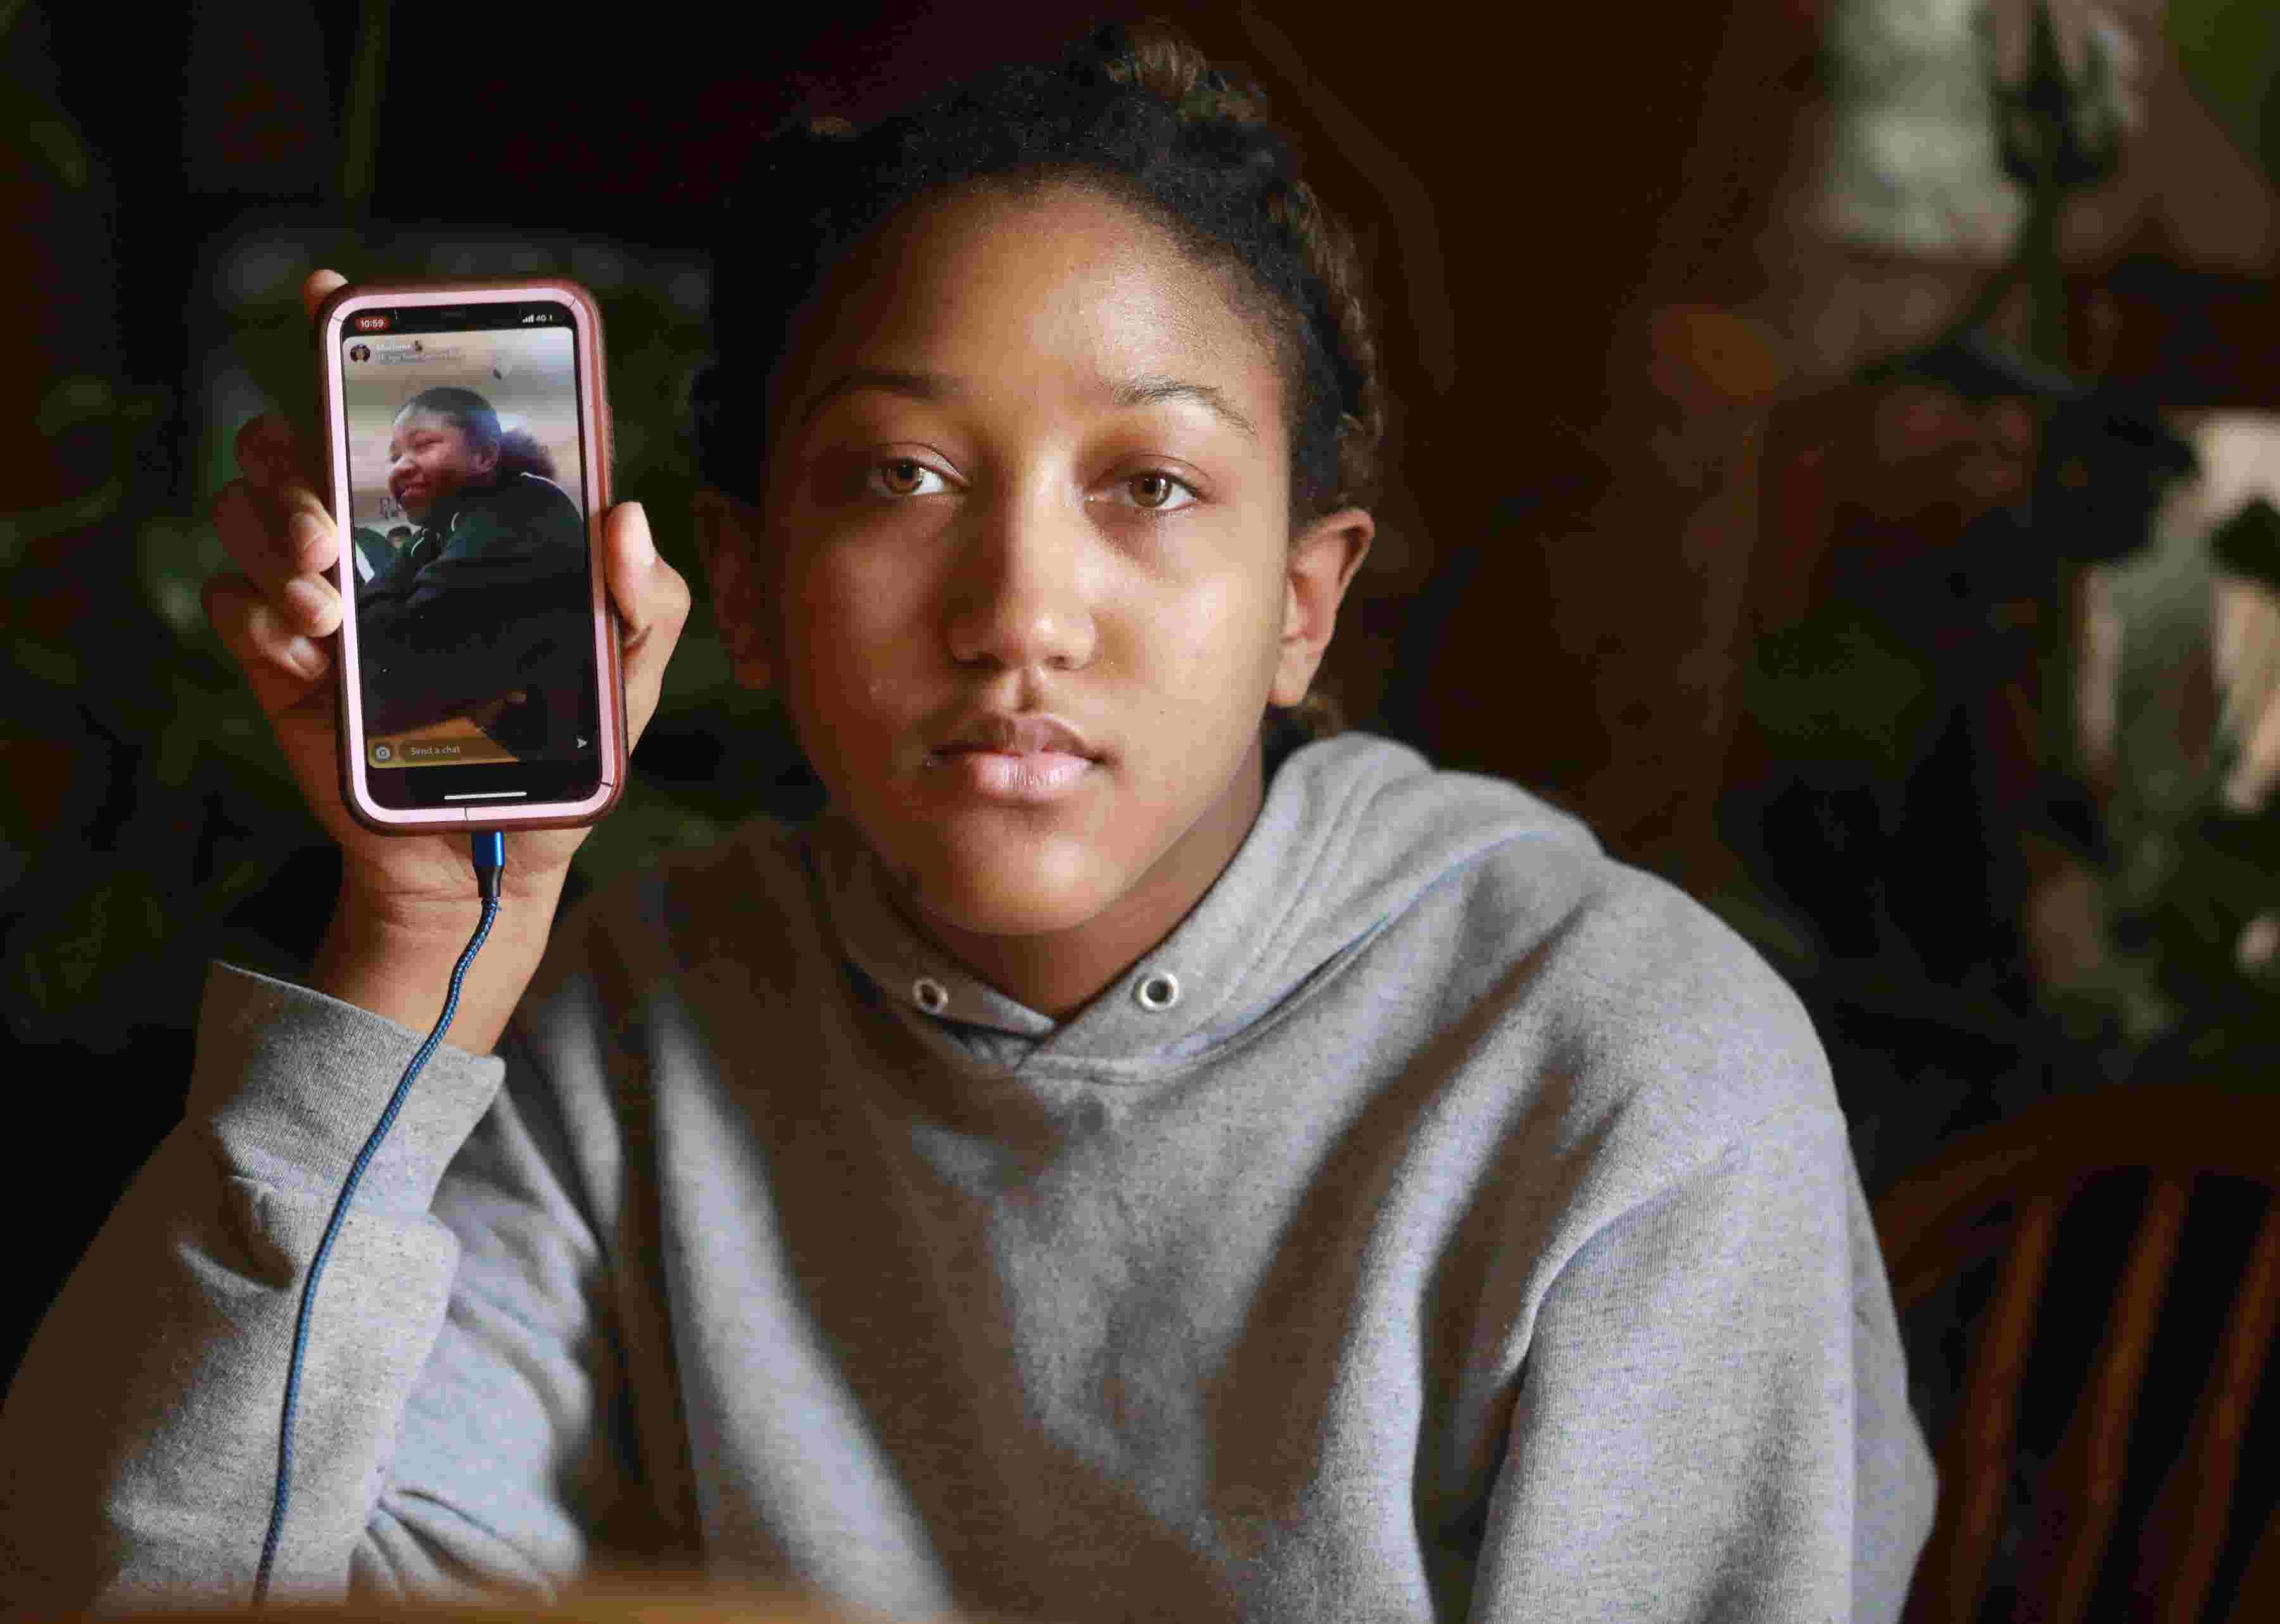 Aaliyaha Tucker, friend of Ma'Khia Bryant speaks of her personality